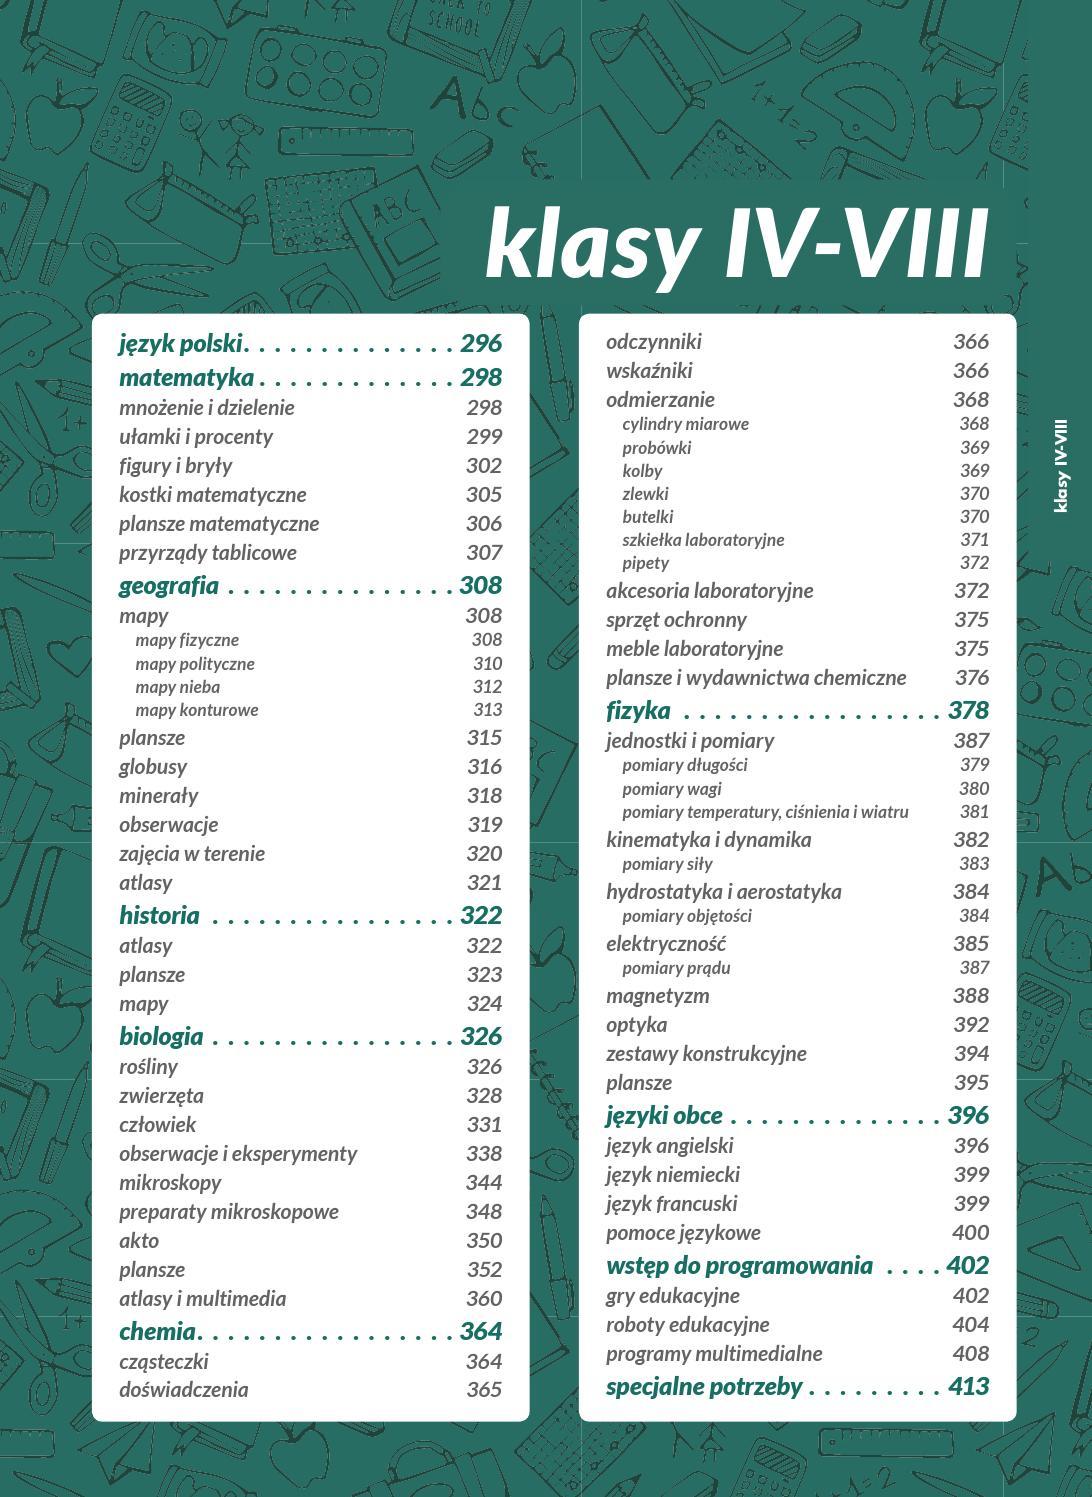 Ns Szkola 2018 Mini 03 Klasy Iv Viii By Nowa Szkola Issuu